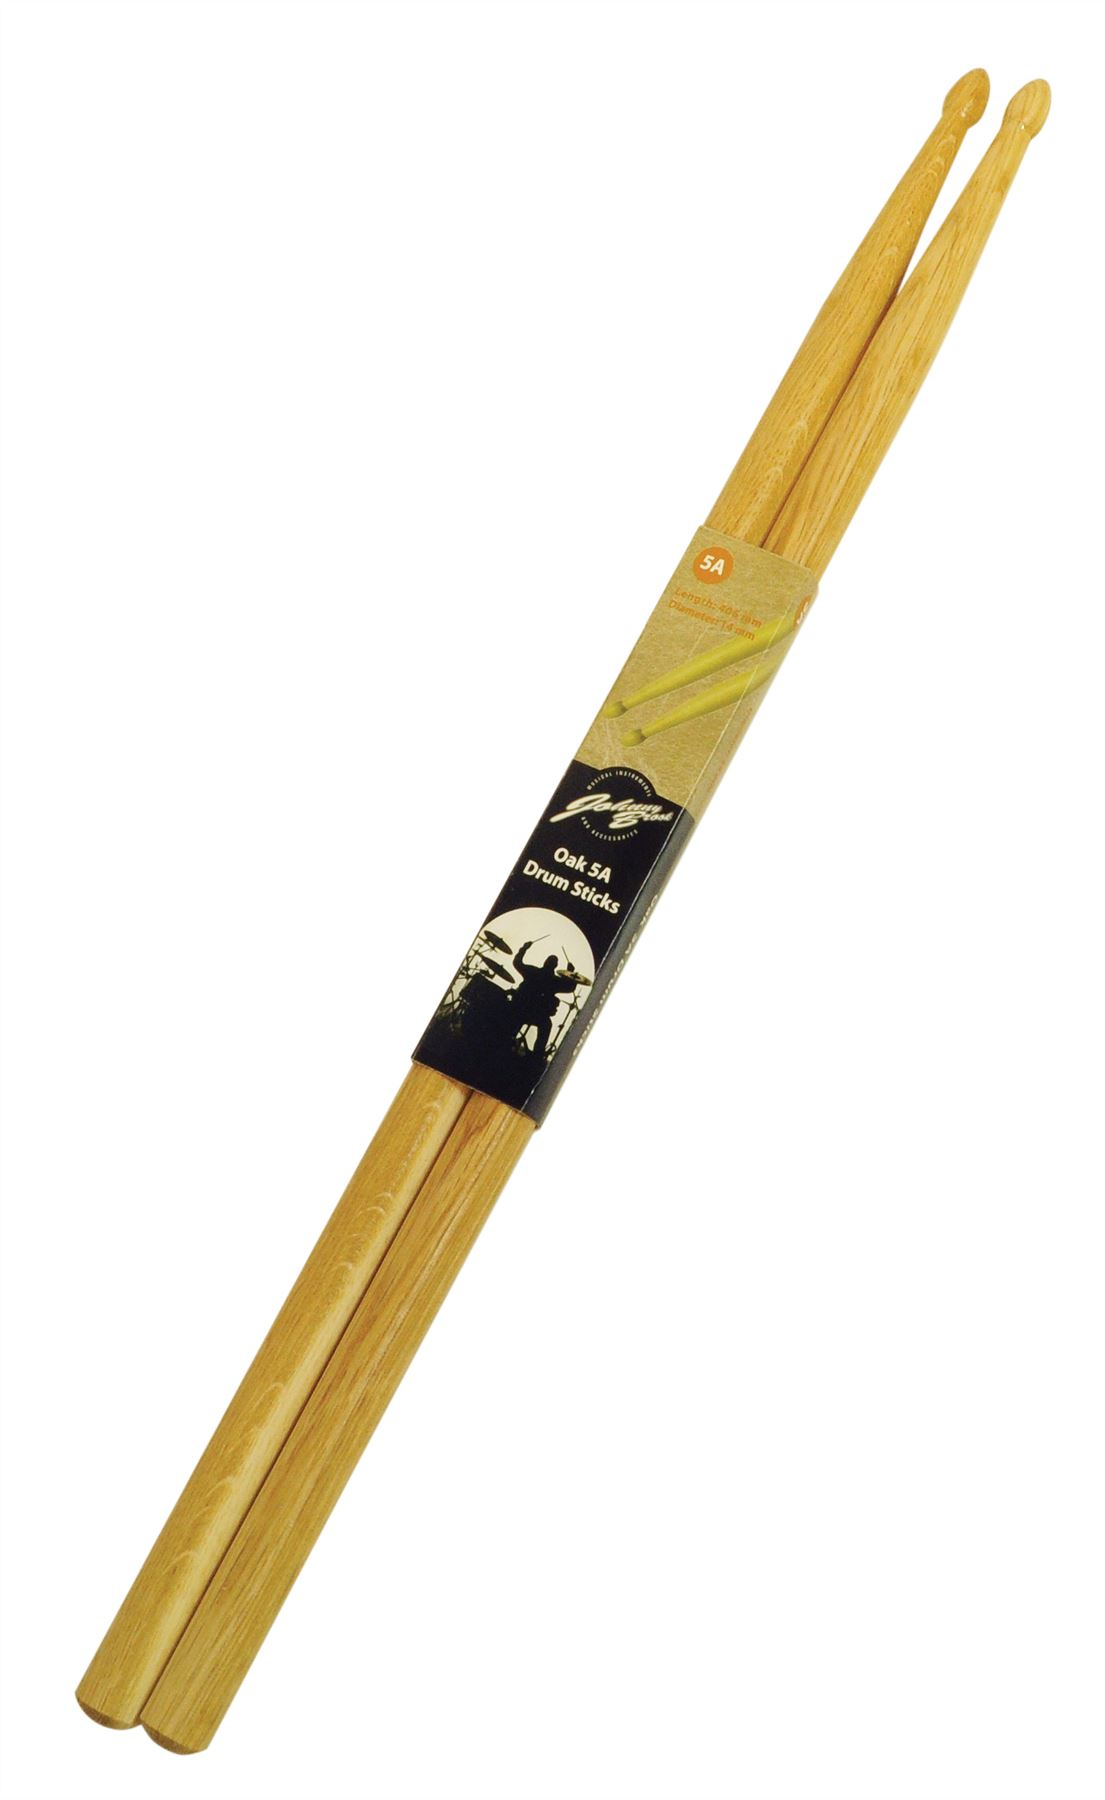 Johnny-Brook-Oak-Drum-Sticks-Musical-Instrument